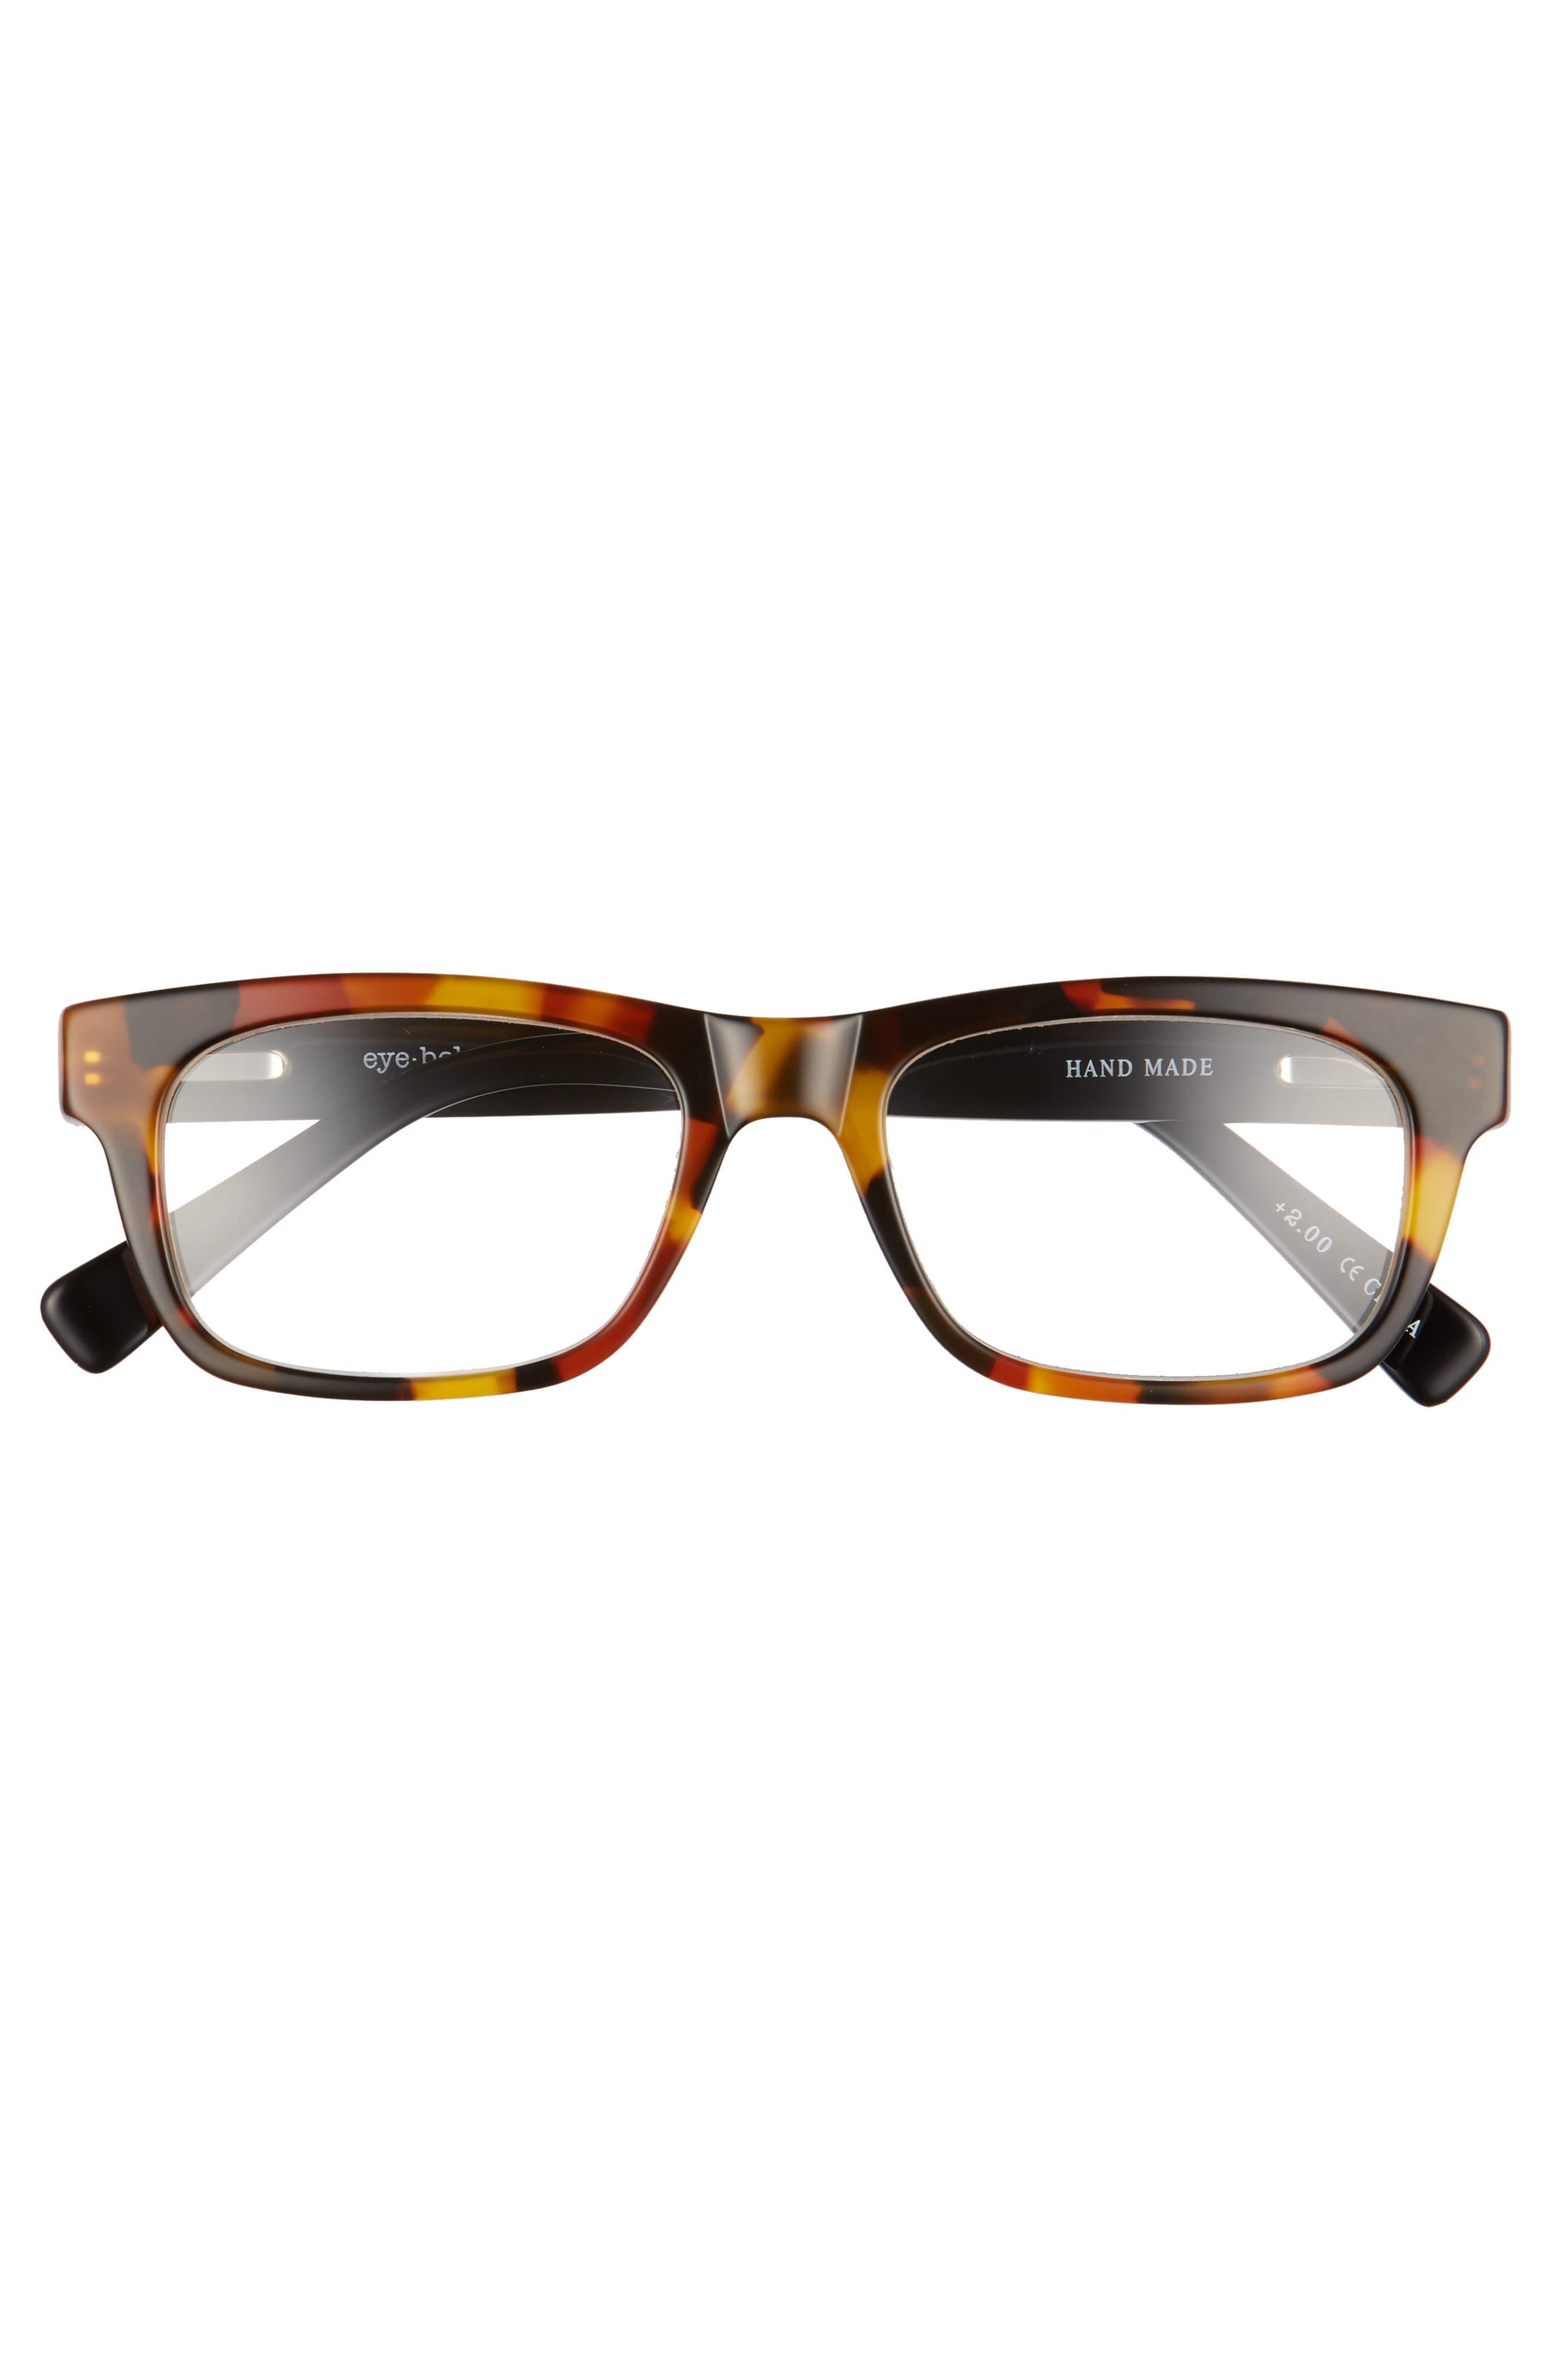 Style Guy 52mm Reading Glasses,                             Alternate thumbnail 2, color,                             TORTOISE WITH BLACK